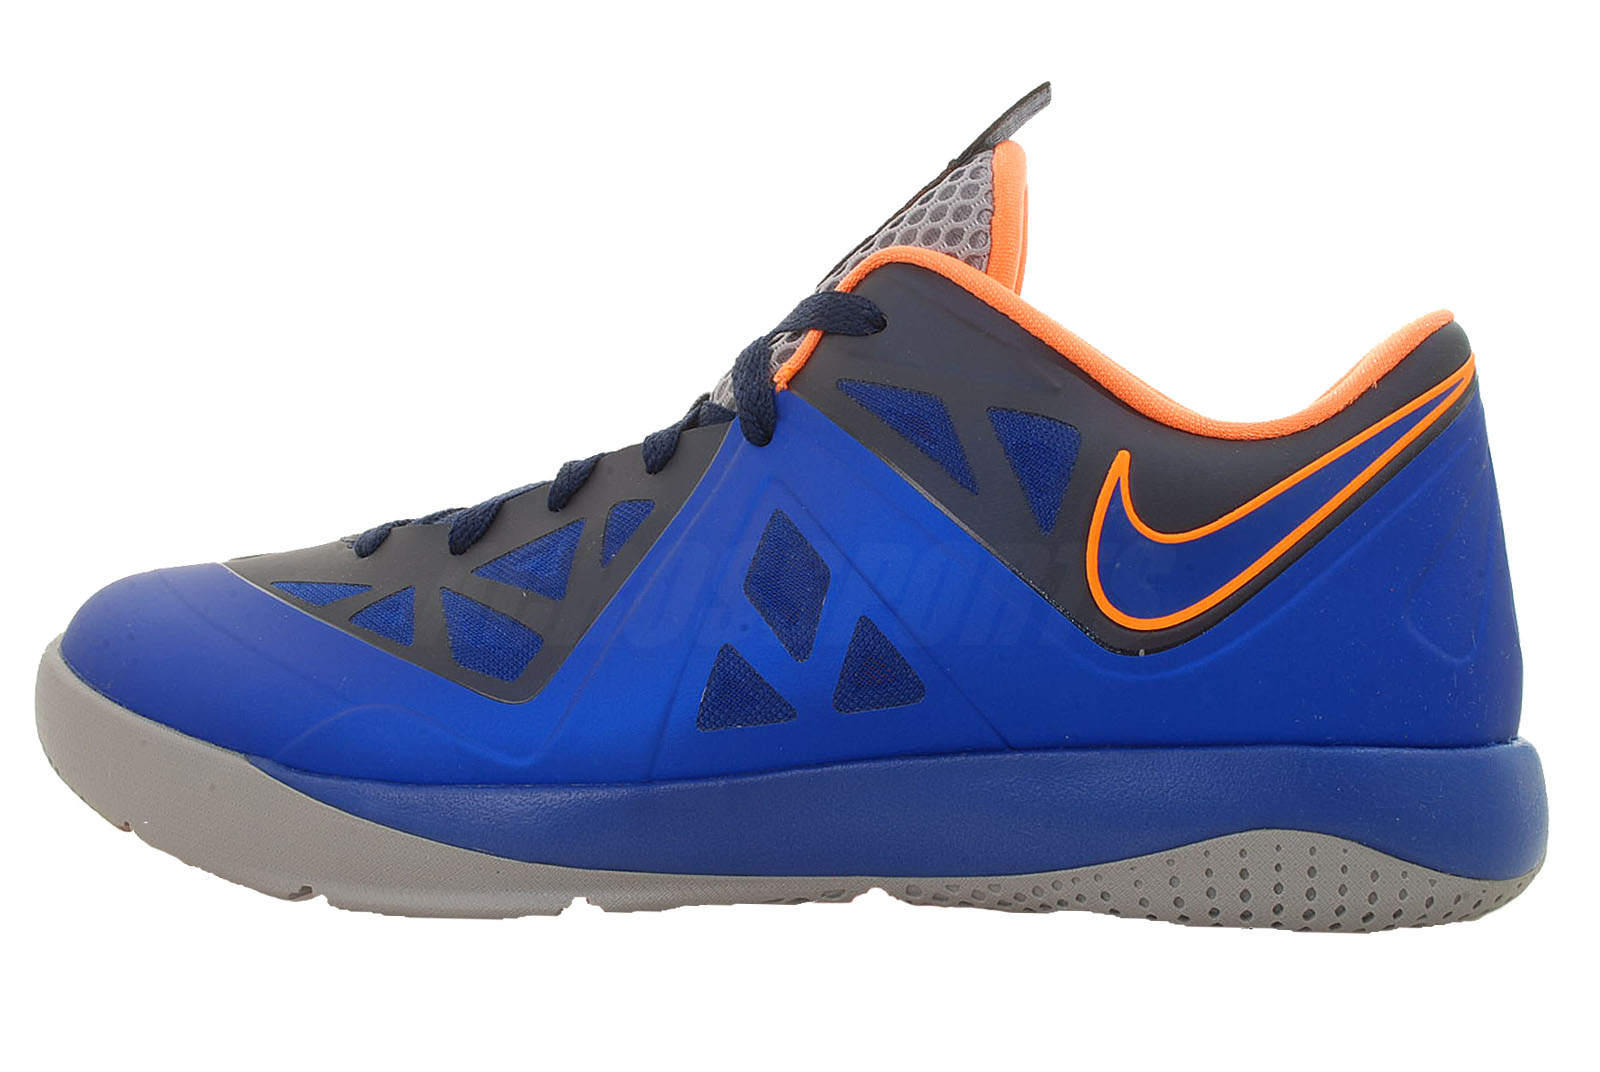 1600x1072 Clip Art Basketball Shoes Clipart